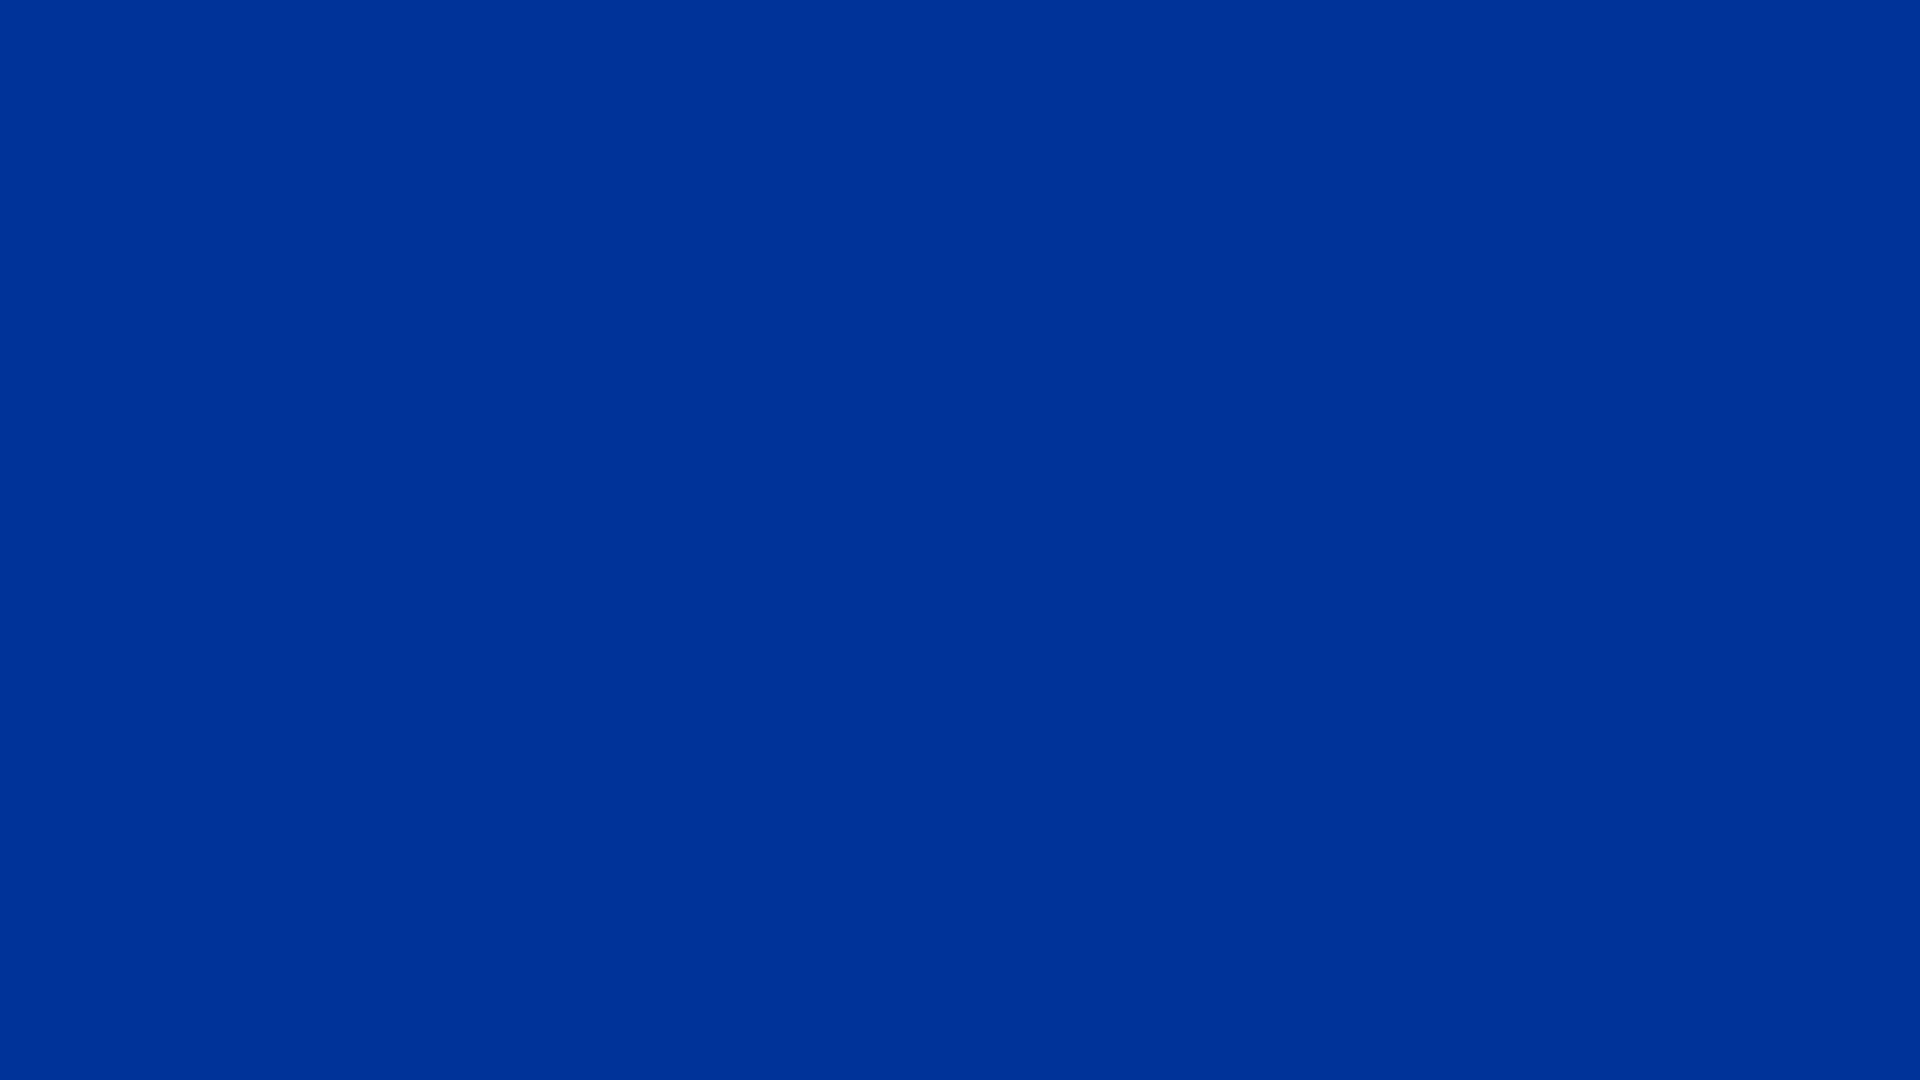 1920x1080 Smalt Dark Powder Blue Solid Color Background